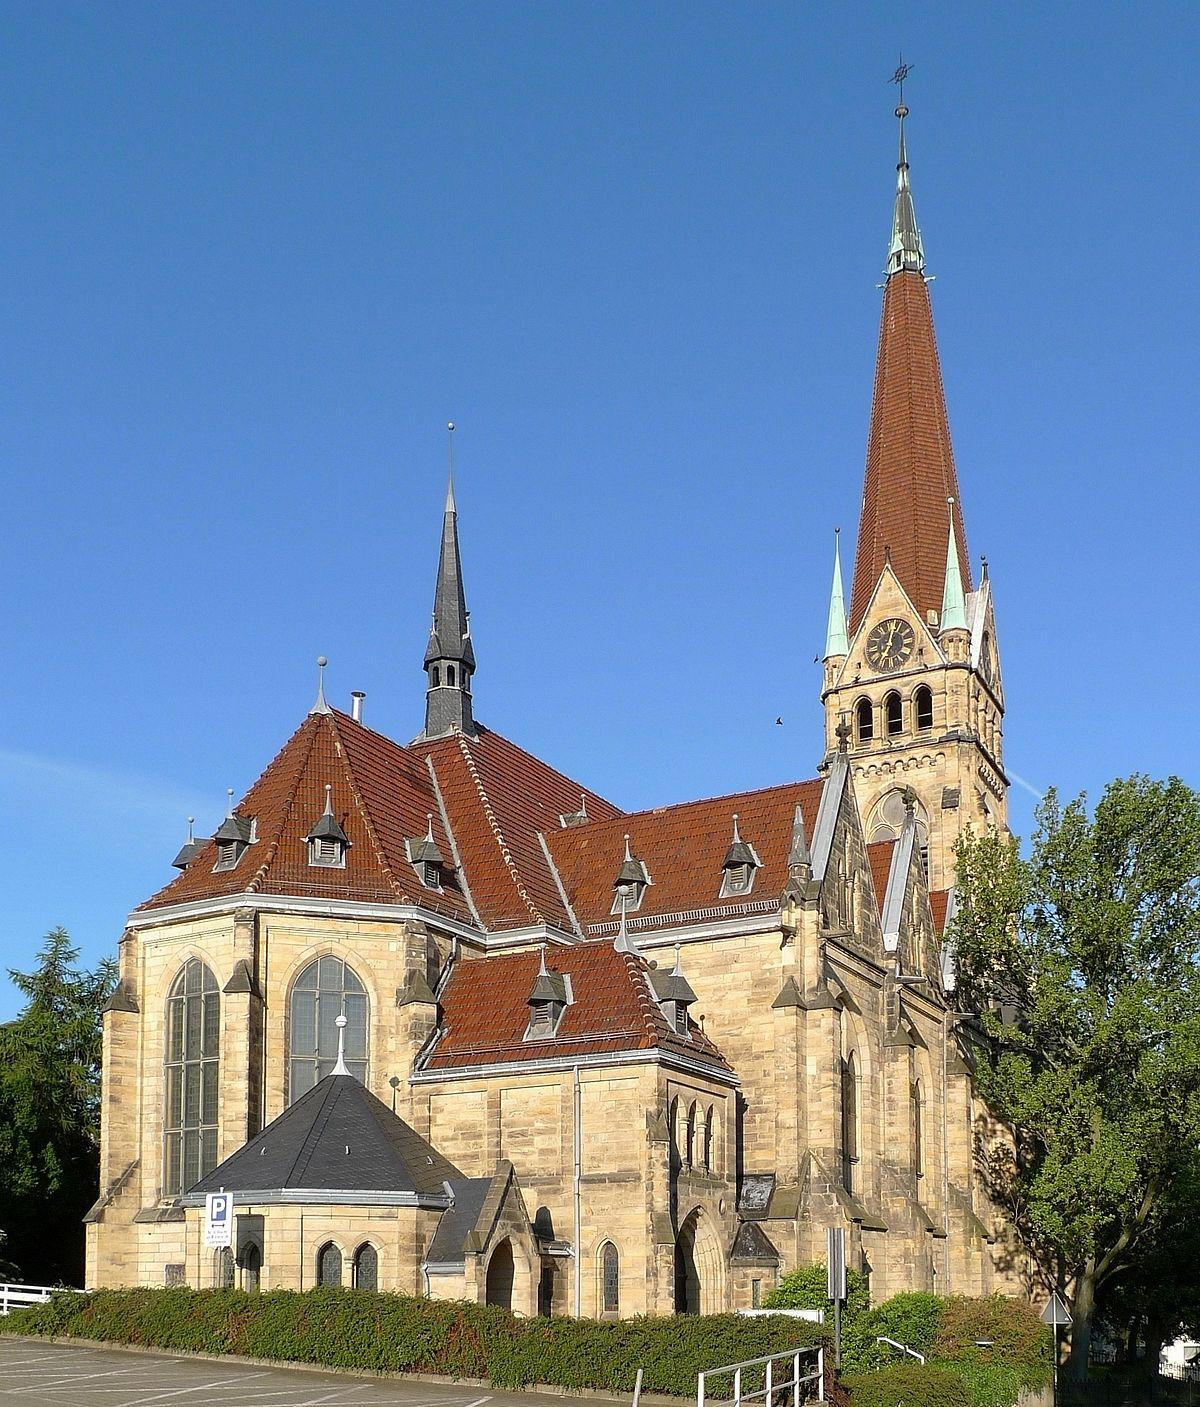 lutherkirche bad harzburg wikipedia. Black Bedroom Furniture Sets. Home Design Ideas